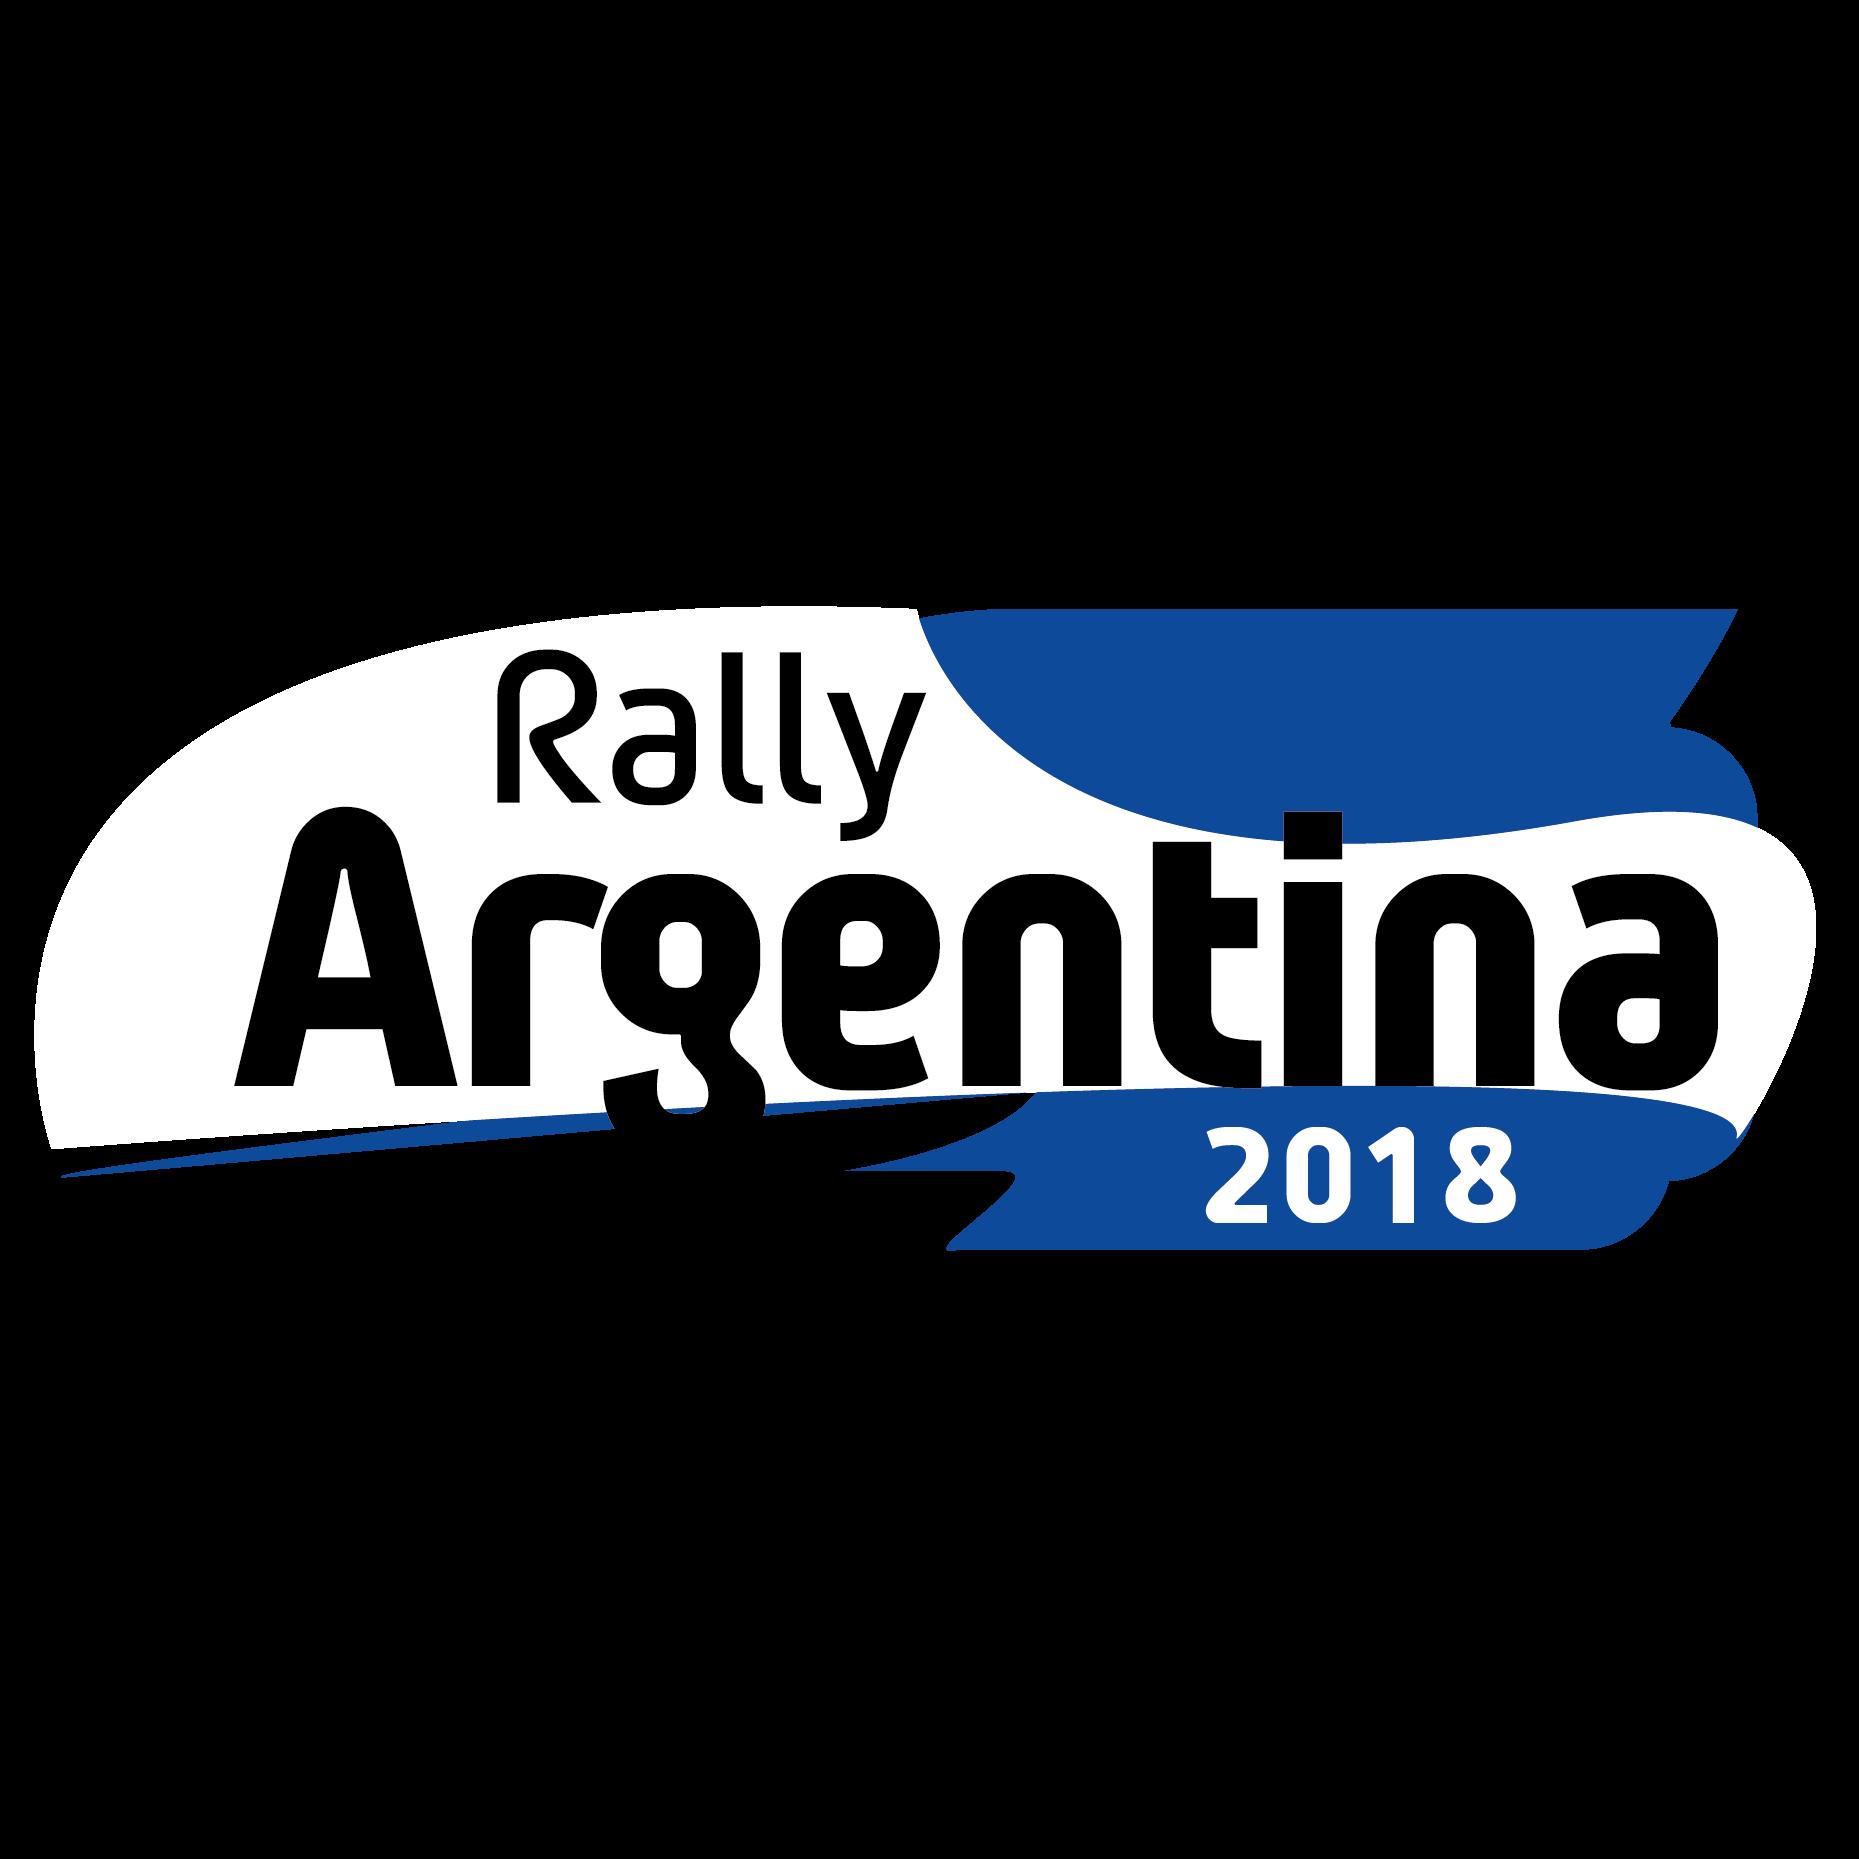 2018 World Rally Championship - Rally Argentina